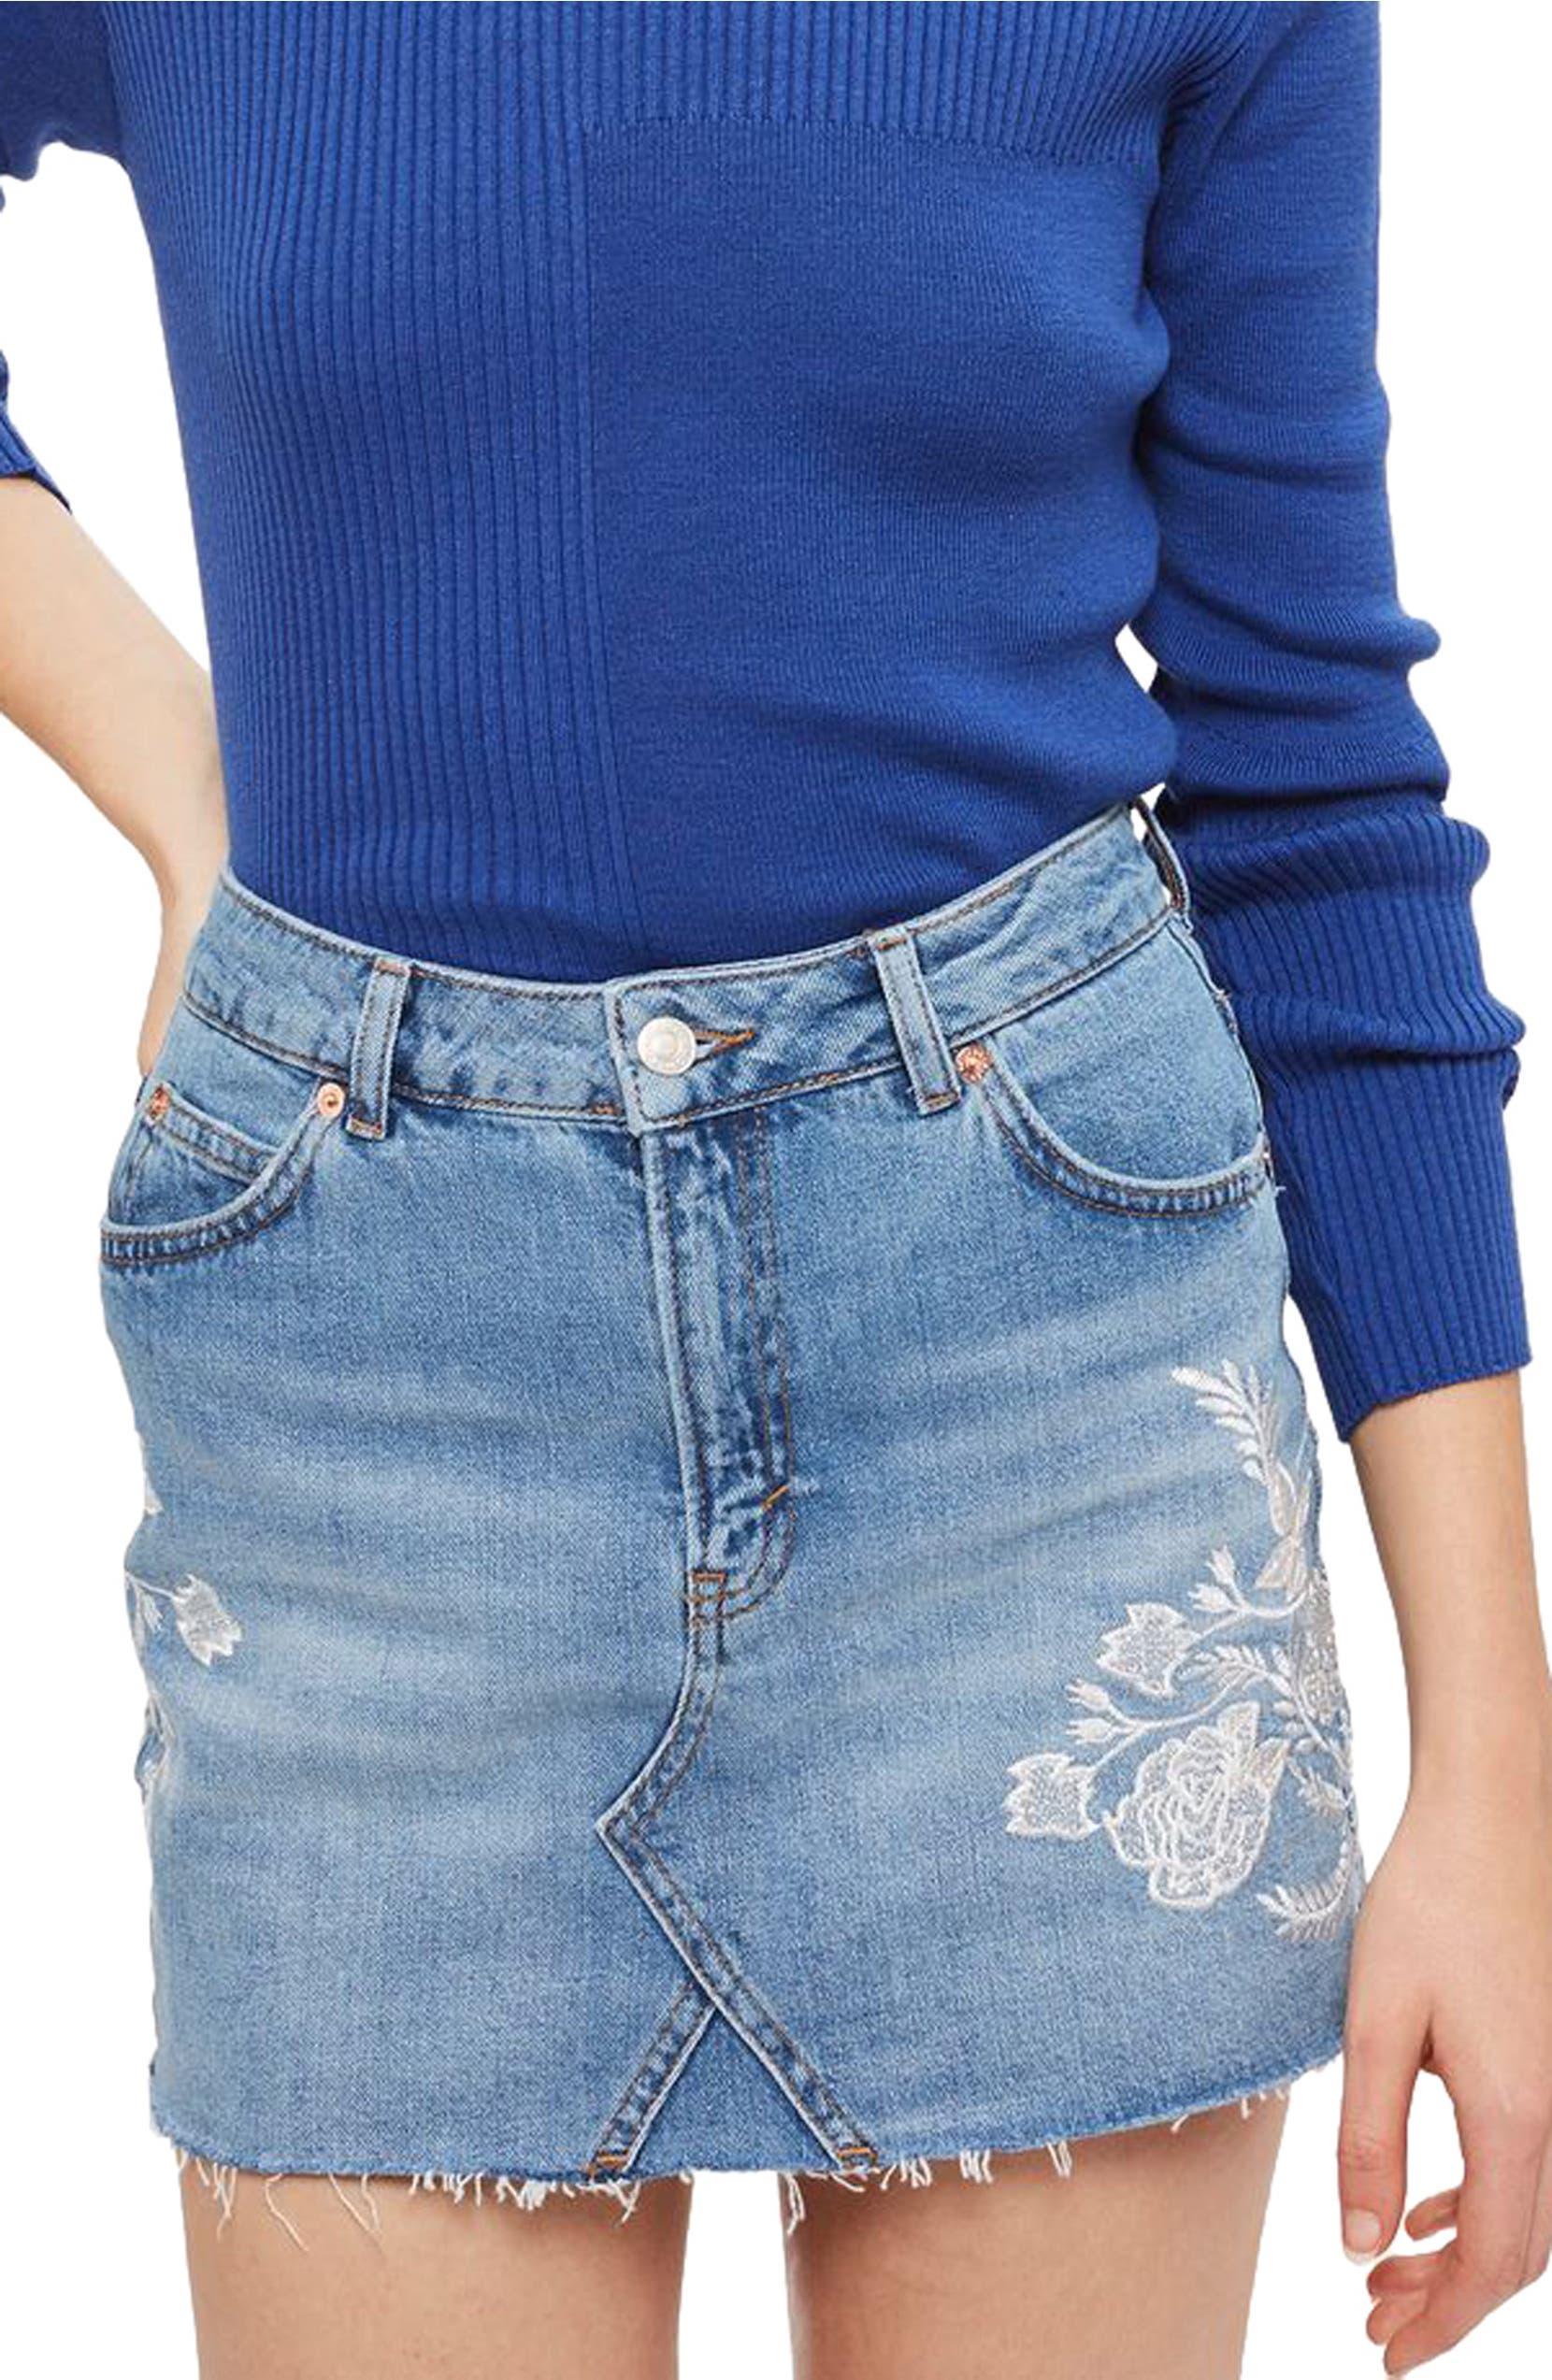 3f5b18140284 Topshop Button Denim Mini Skirt - raveitsafe